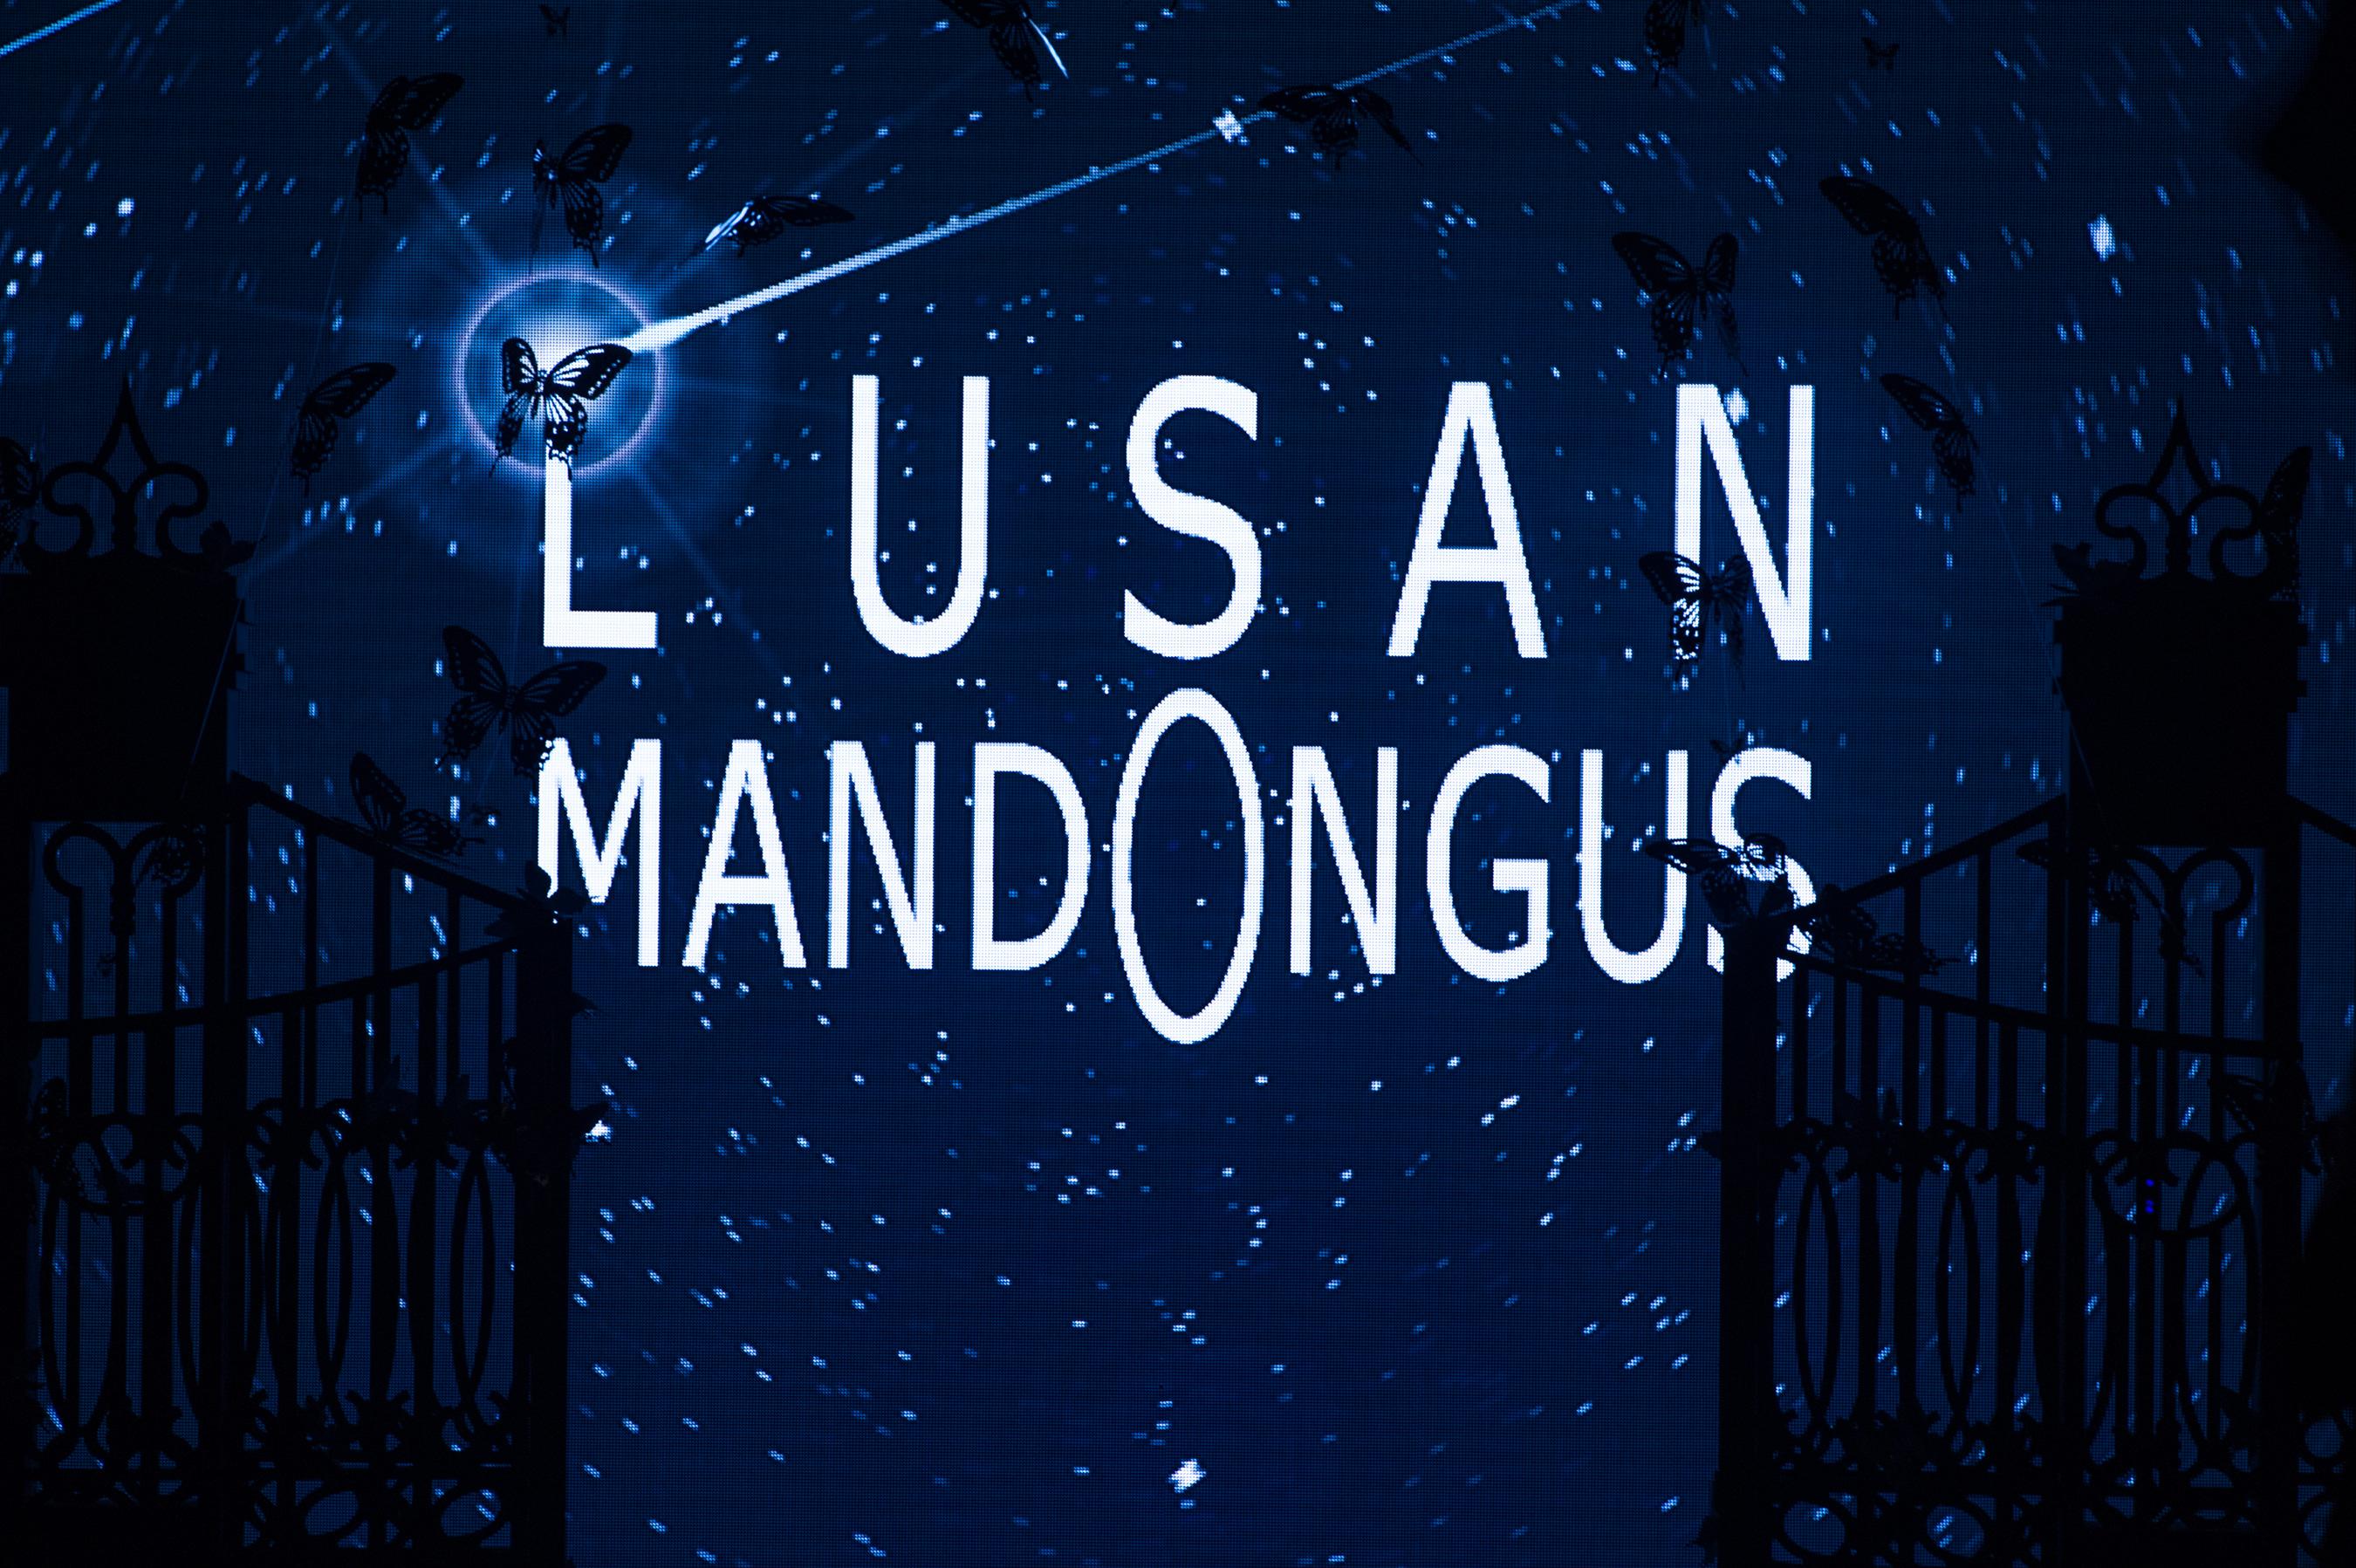 Lusan Mandongus brd RS17 0001